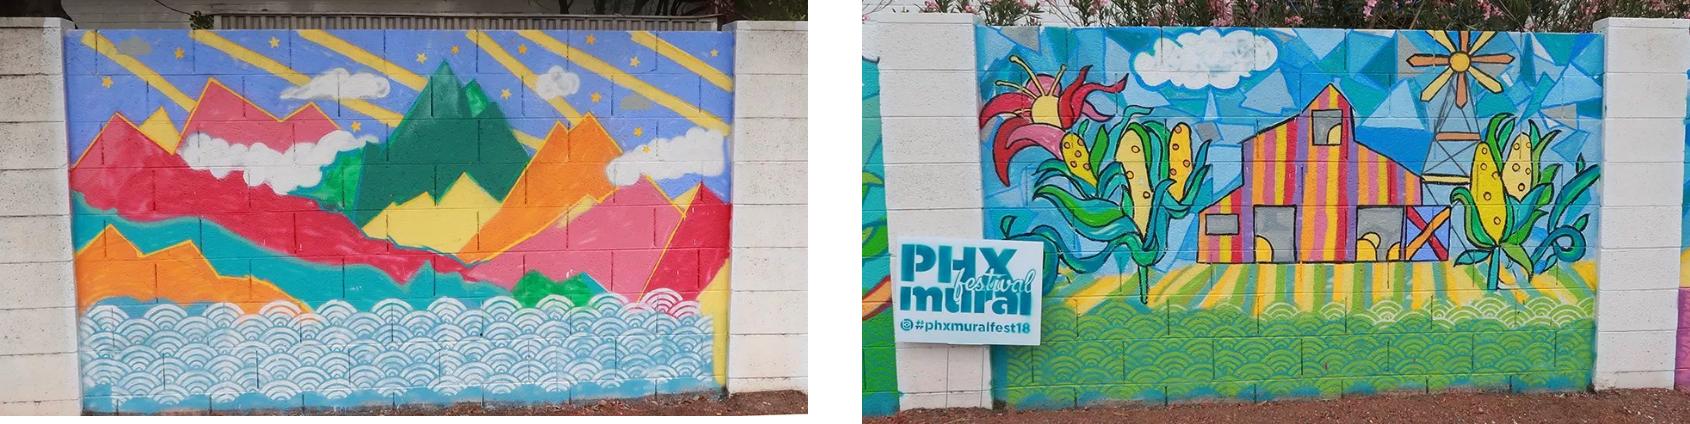 6. Phoenix Mural Festival.png